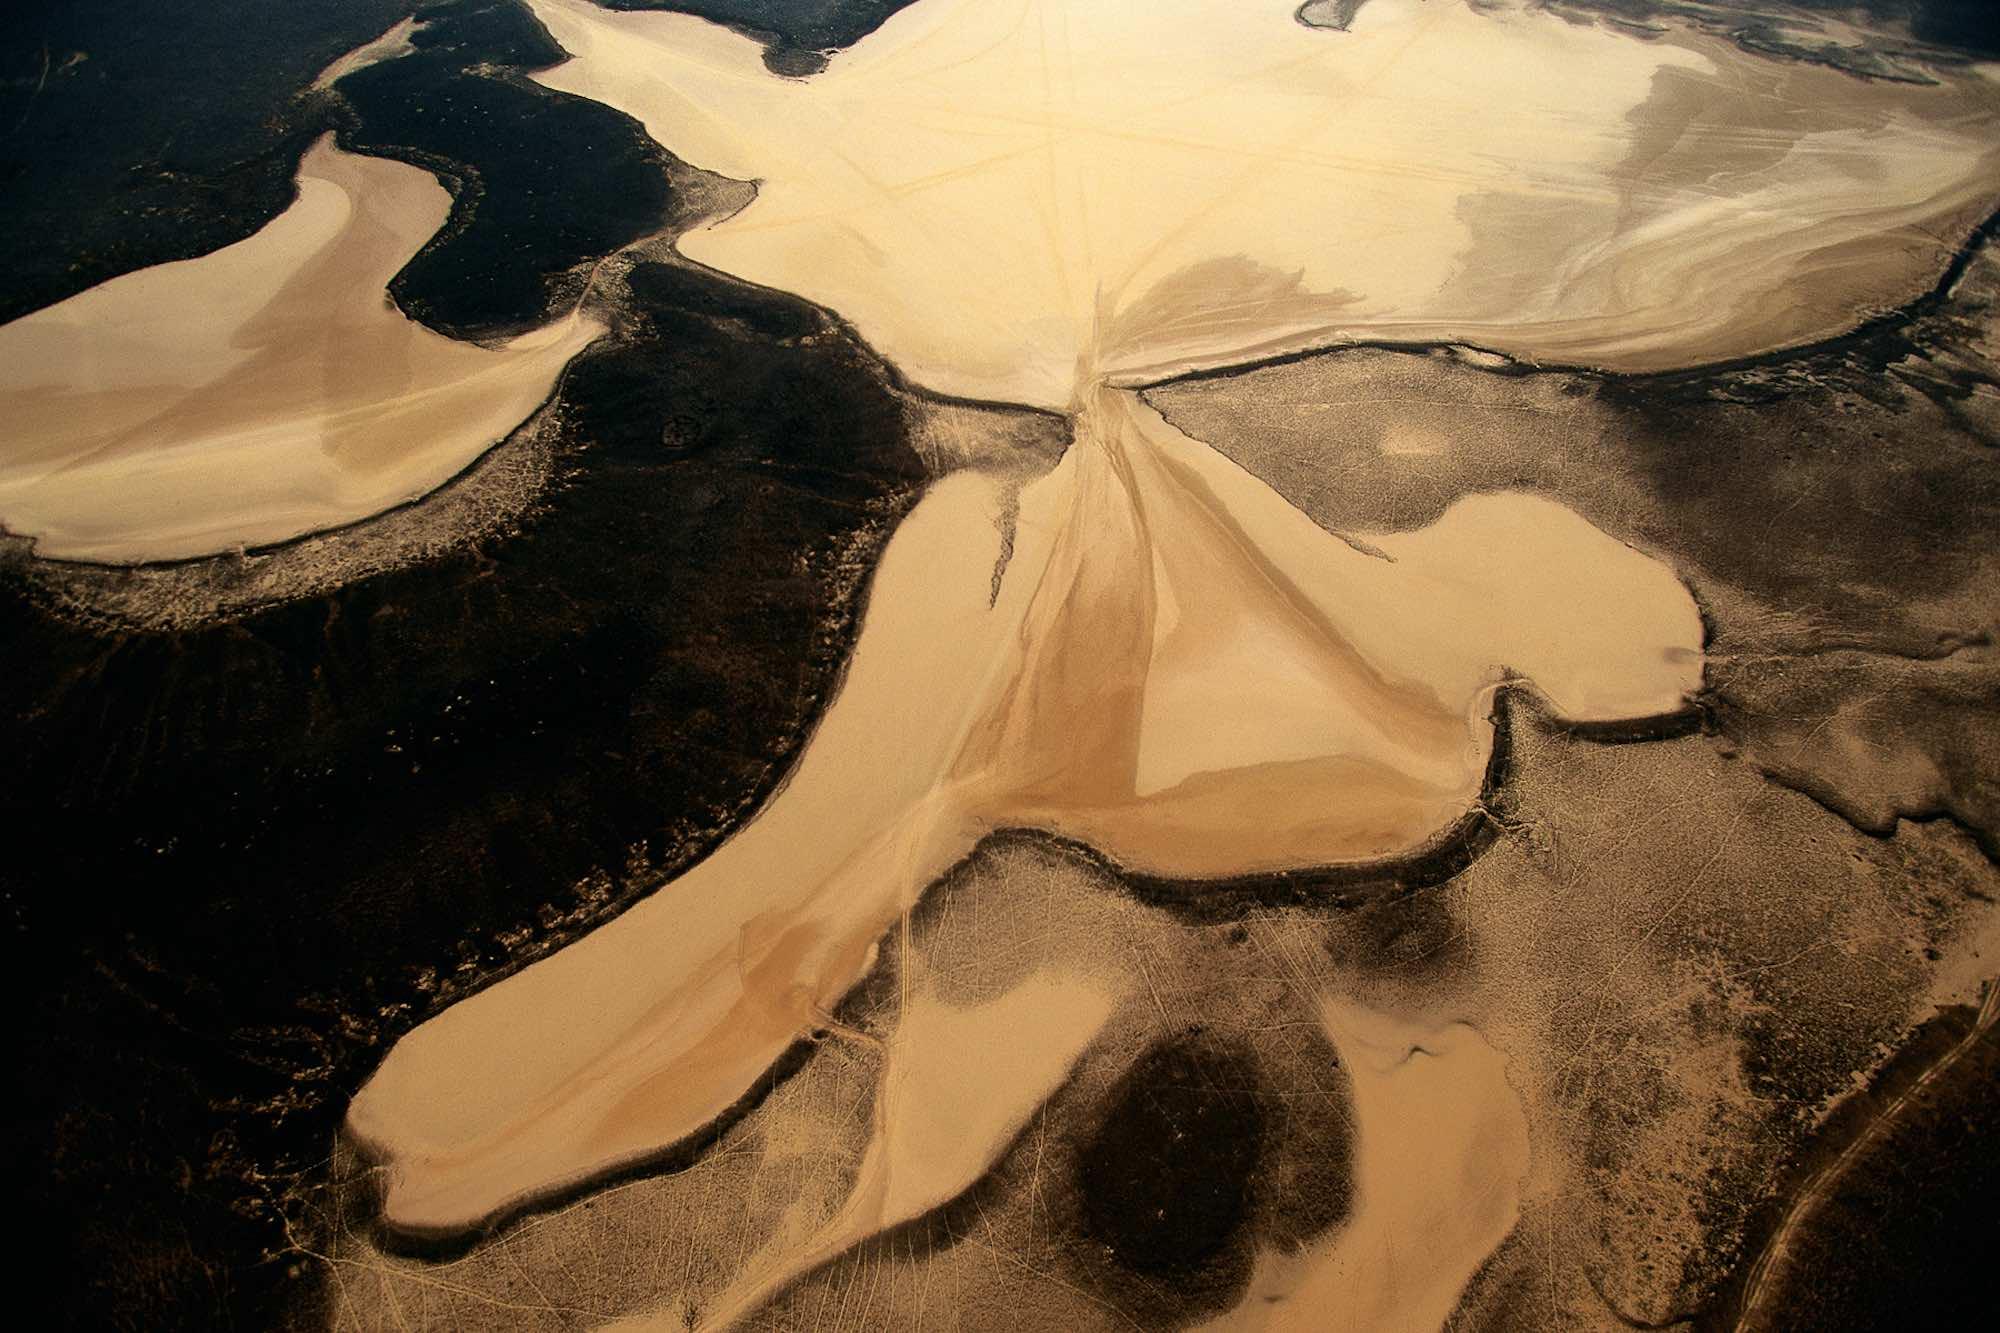 Sands - Yann Arthus-Bertrand